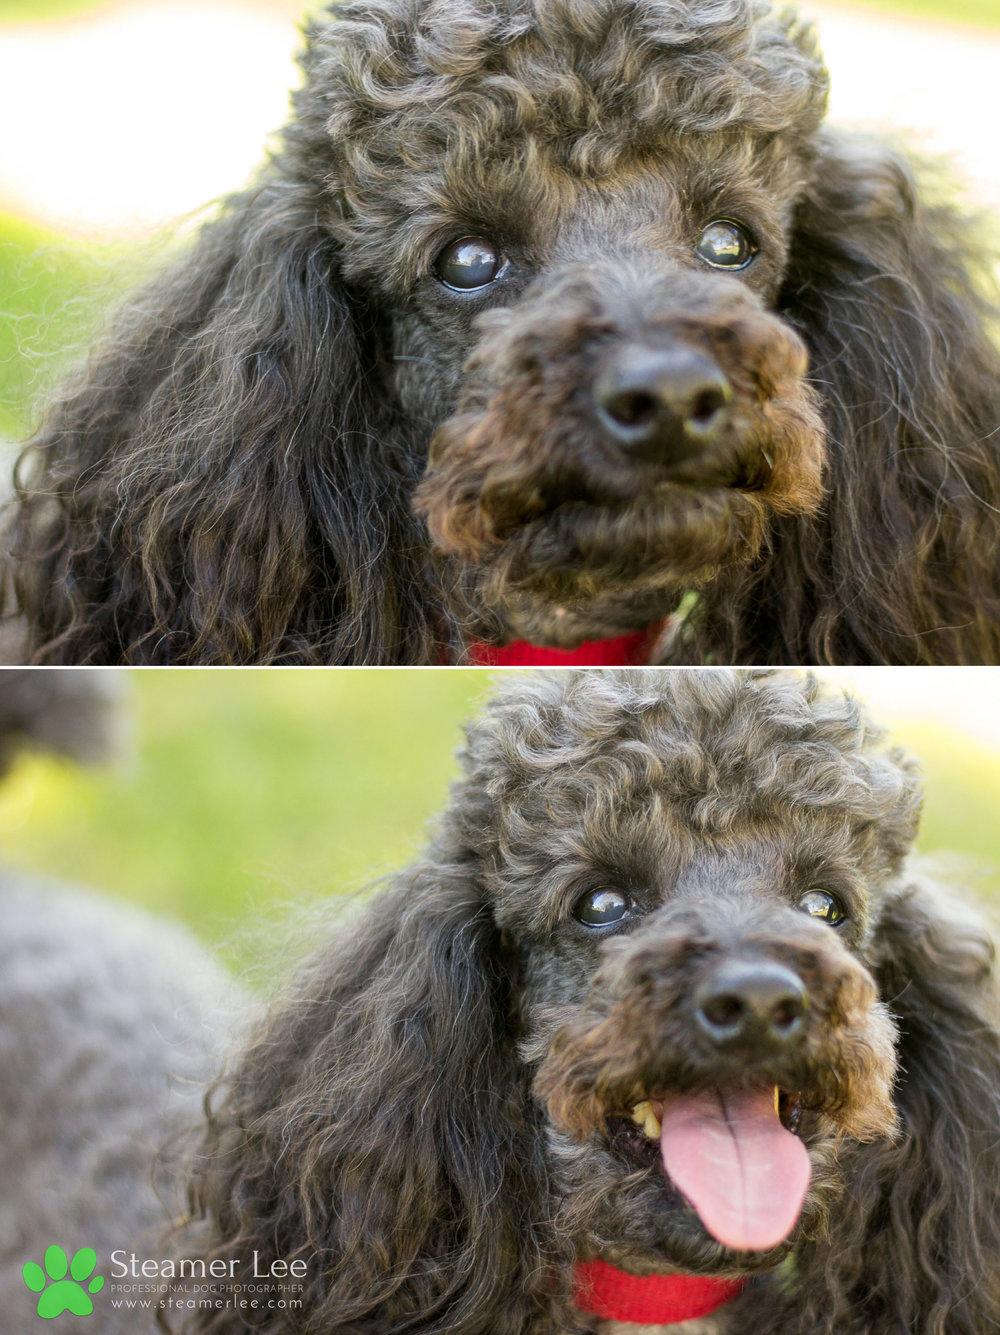 005 Steamer Lee Dog Photography - Orange County Dog Photography - German Shepherd Rottweiler Mix_Poodle.JPG